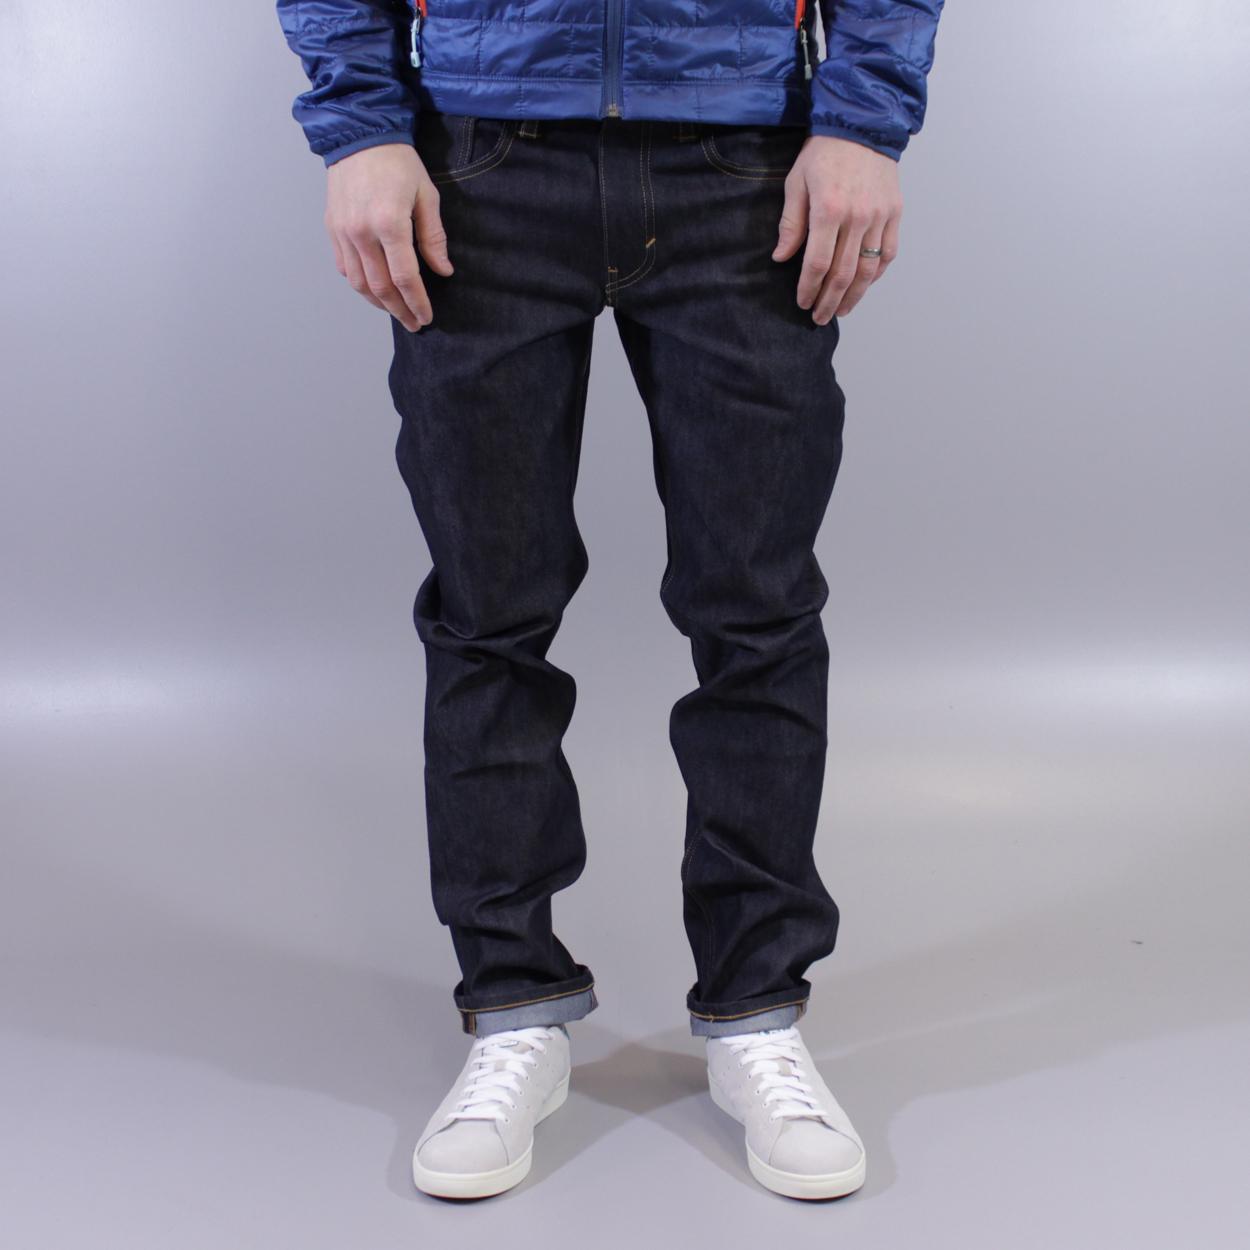 Levi Skate 511 Slim Jeans Rigid Indigo